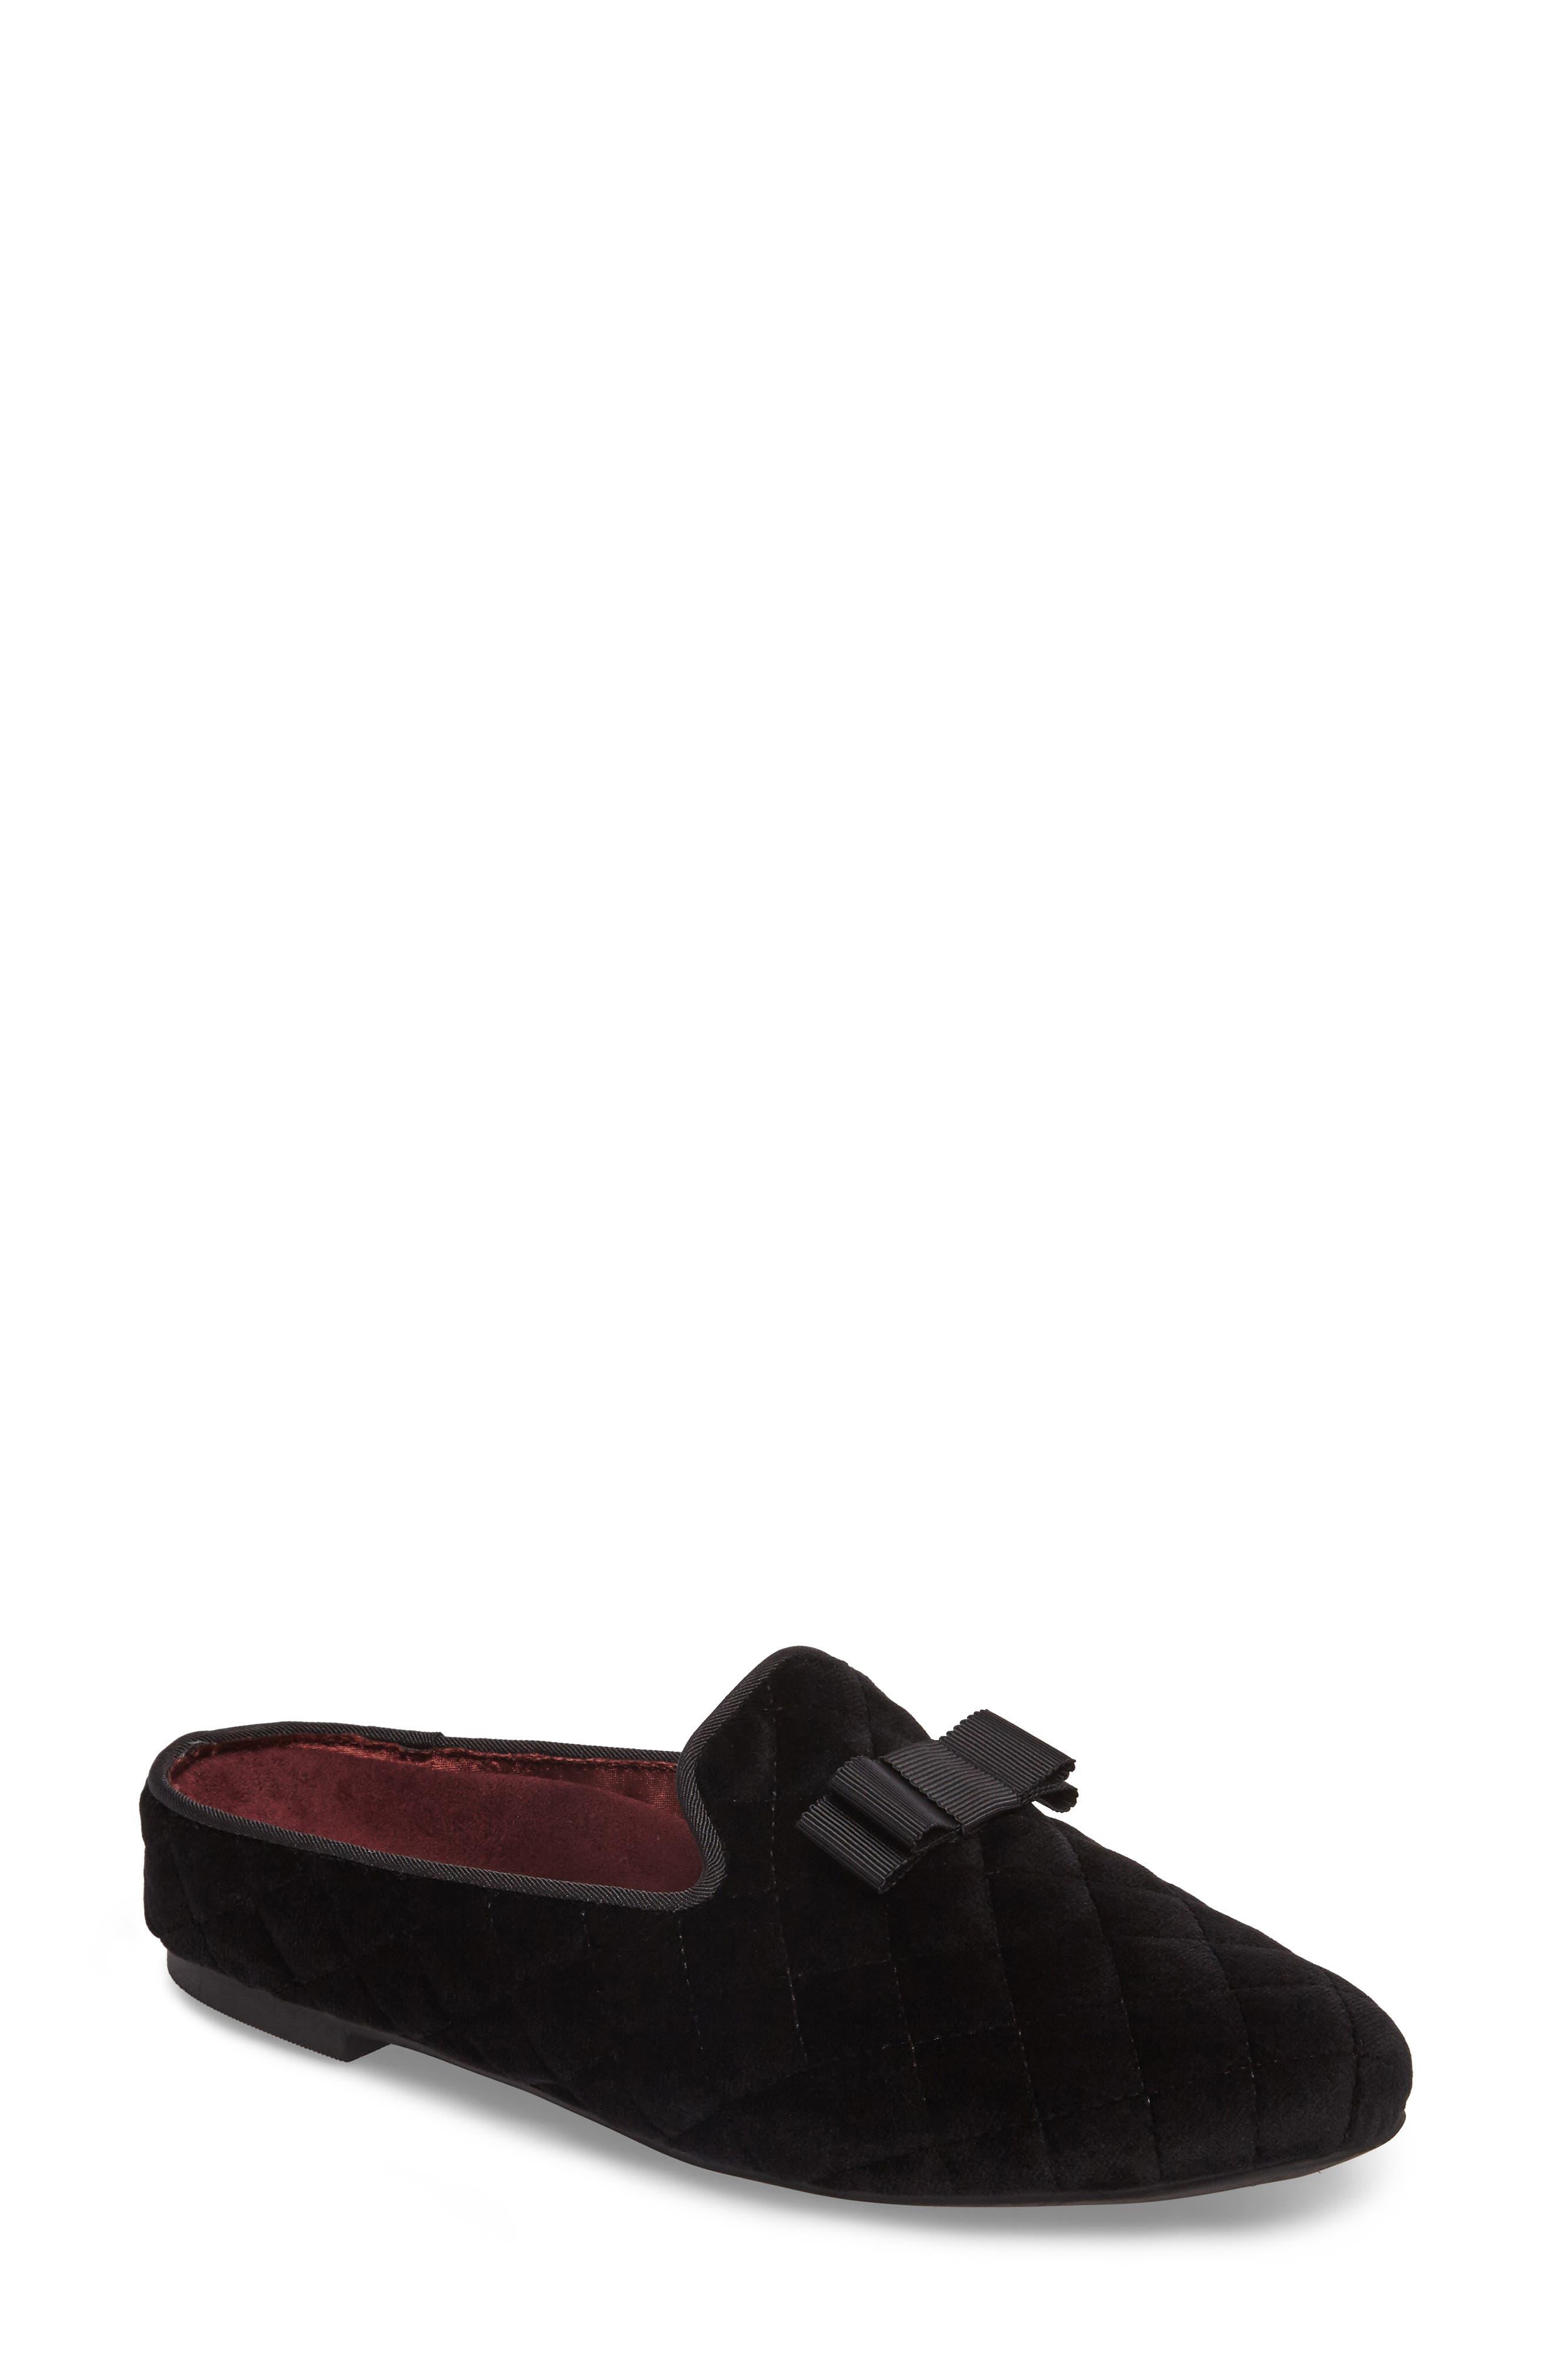 Eloise Slipper Mule,                         Main,                         color, Black Fabric